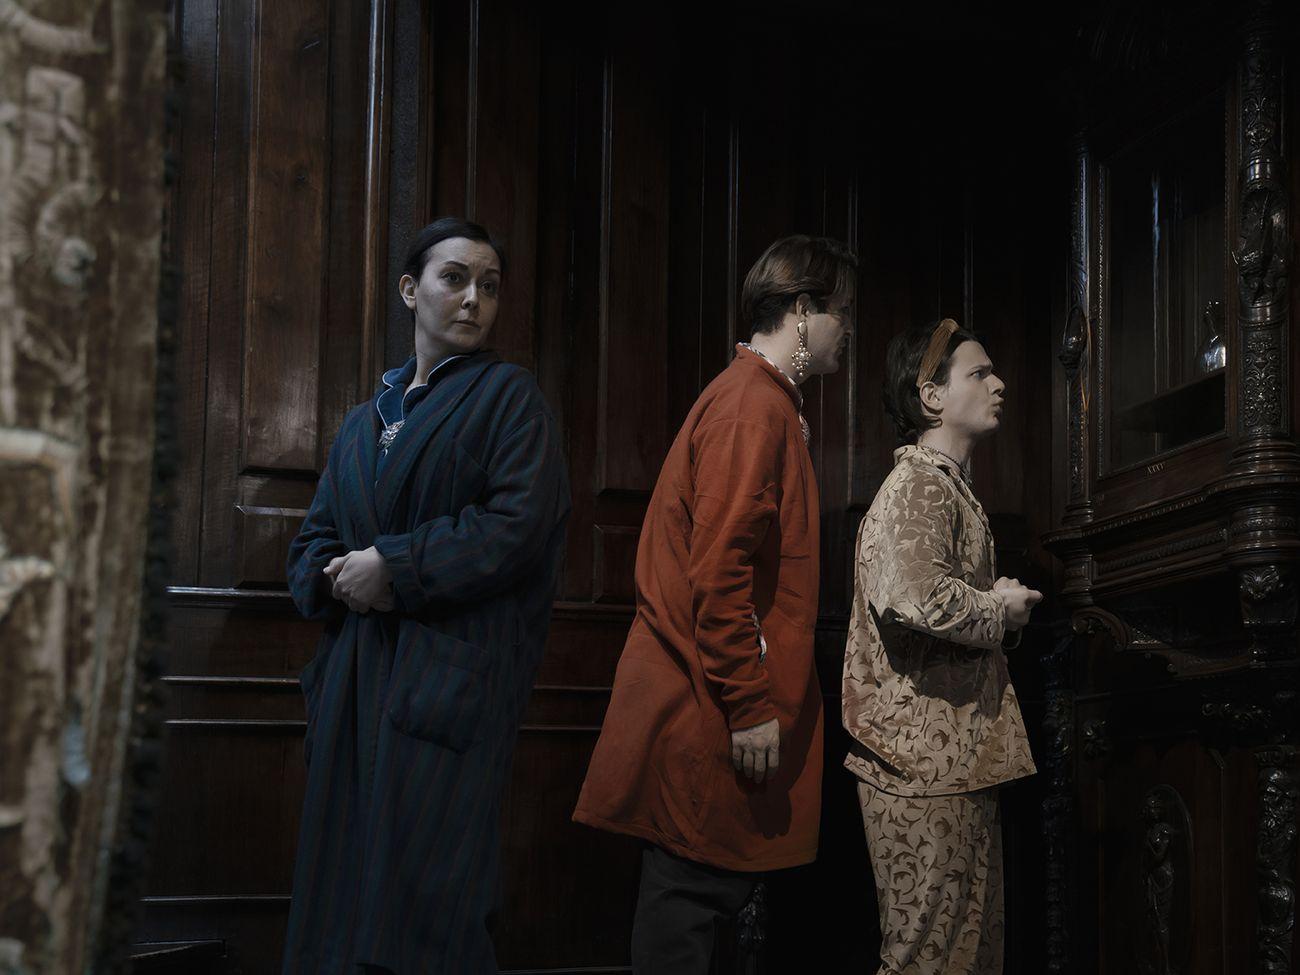 da sx Francesca Borriero, Ivan Iuliucci, Nicola Conforto ne 'Il Lucernario' © Sara Terracciano